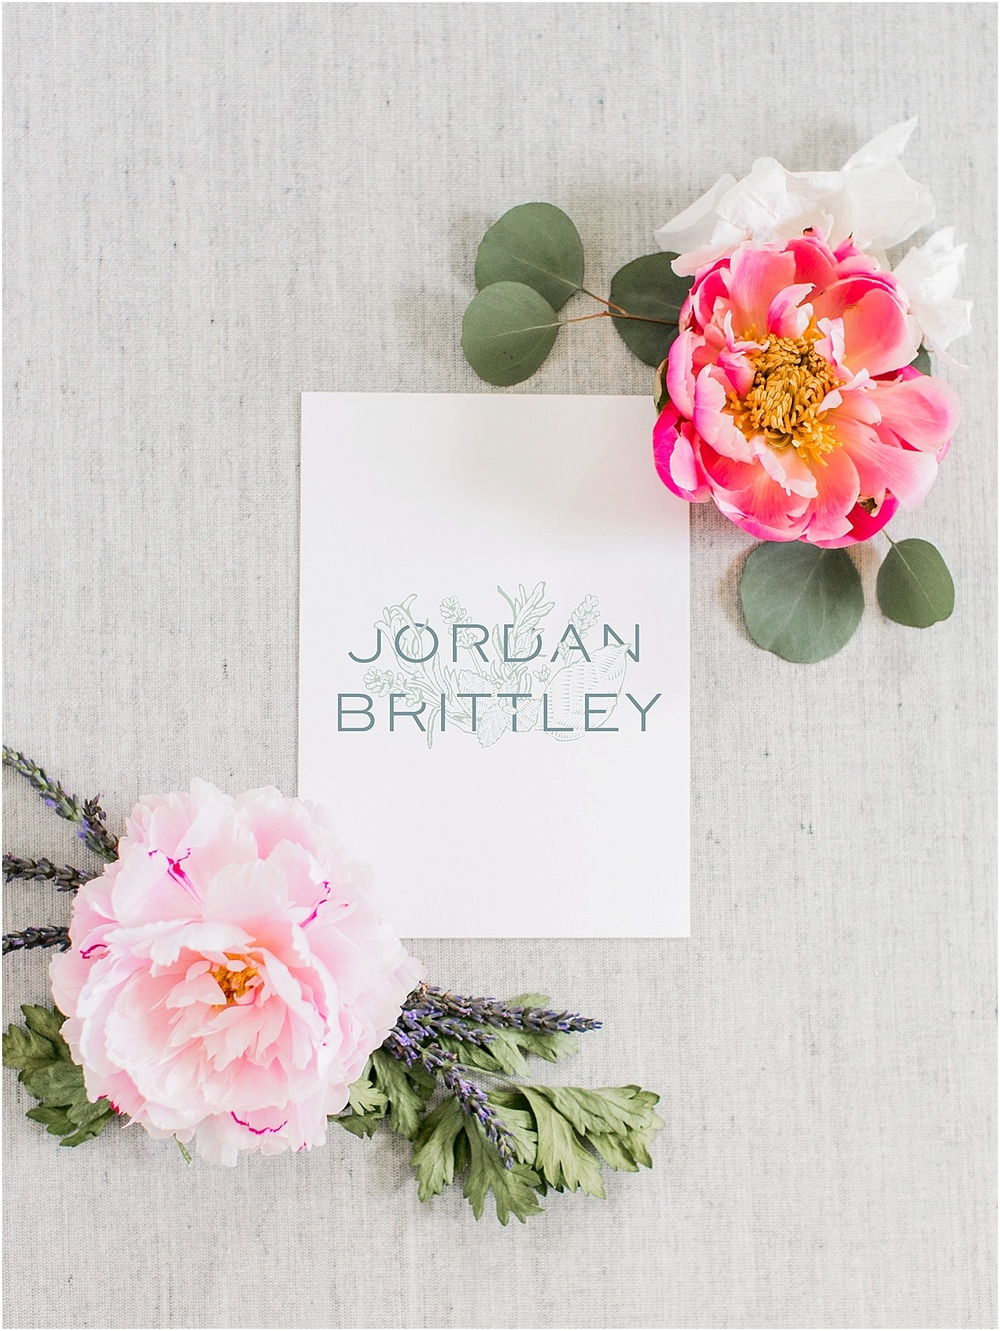 #jordanbrittleyrebrand - Jordan Brittley Photography (www.jordanbrittley.com)